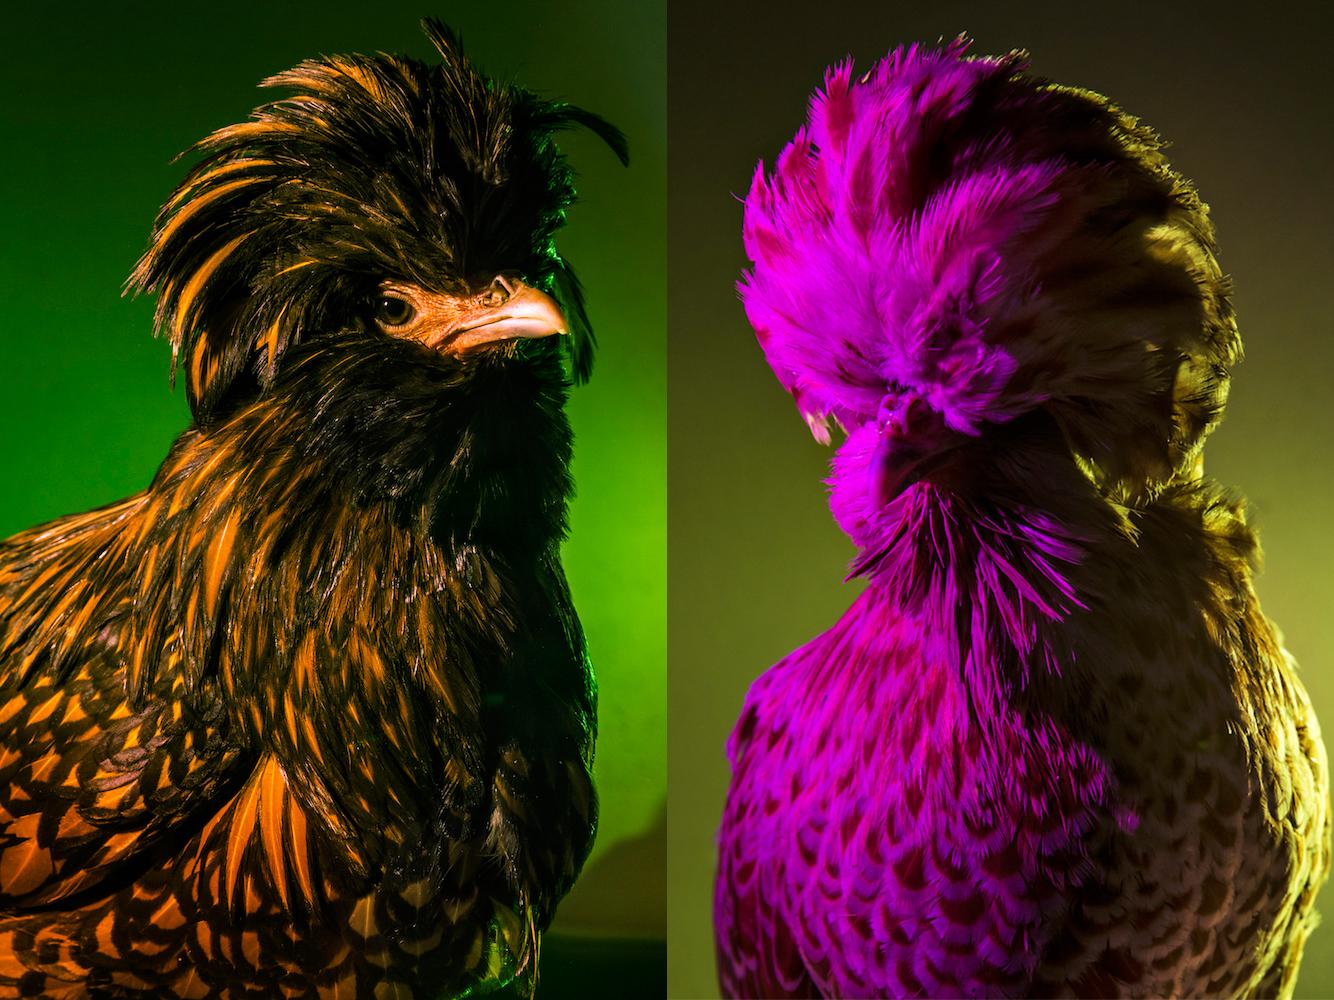 Chic Chicks ©Dan Bannino - Mandy+Chanelle.jpg